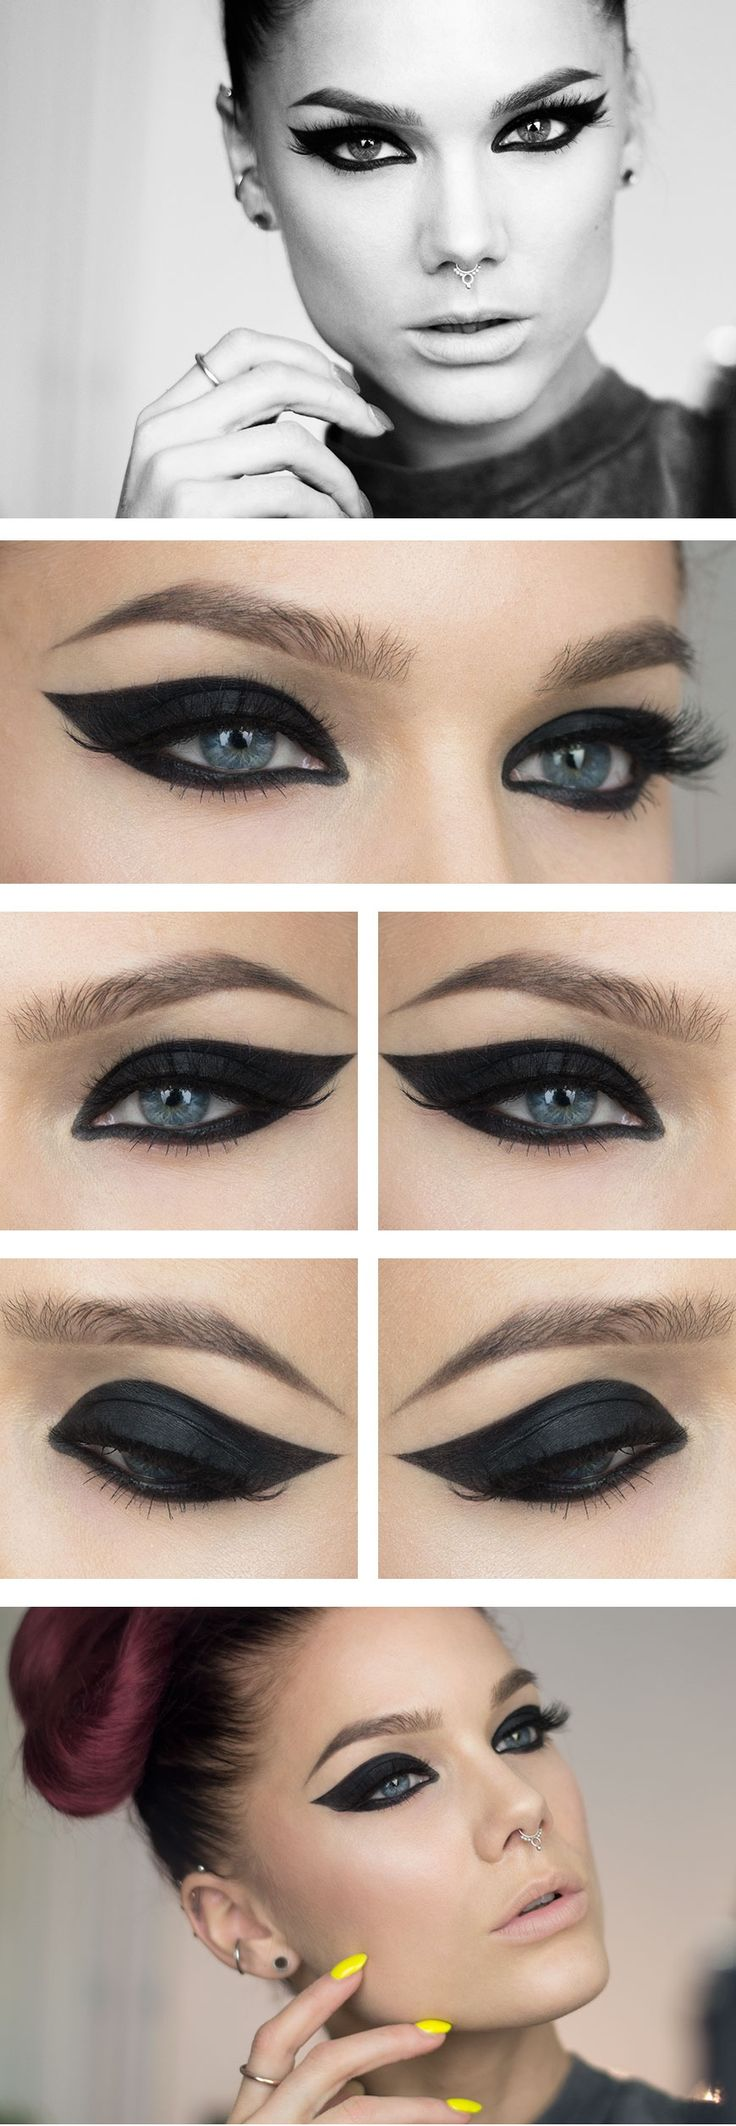 25+ best ideas about Black eyeliner makeup on Pinterest | Eyeline ...